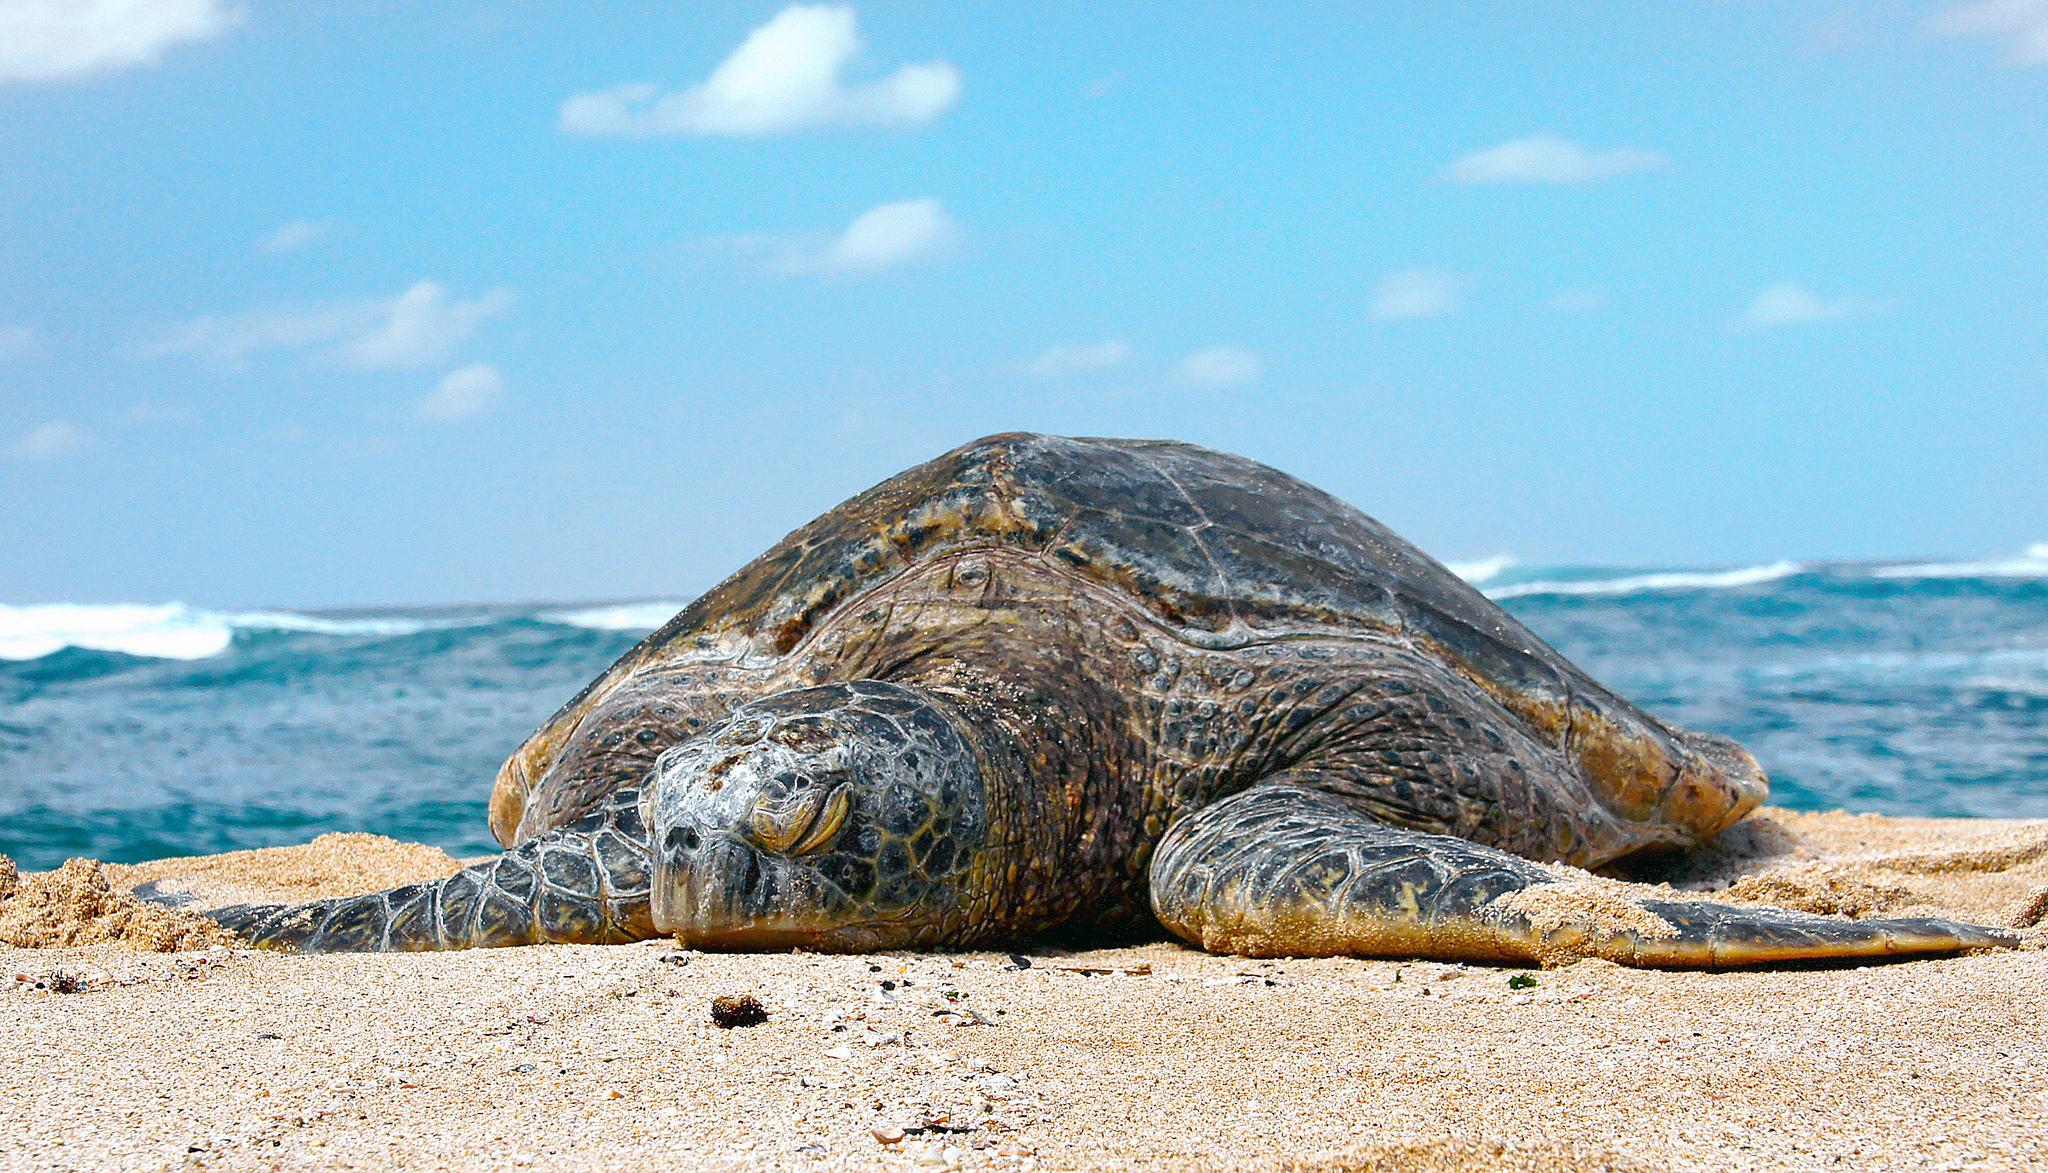 turtles in Hawaii